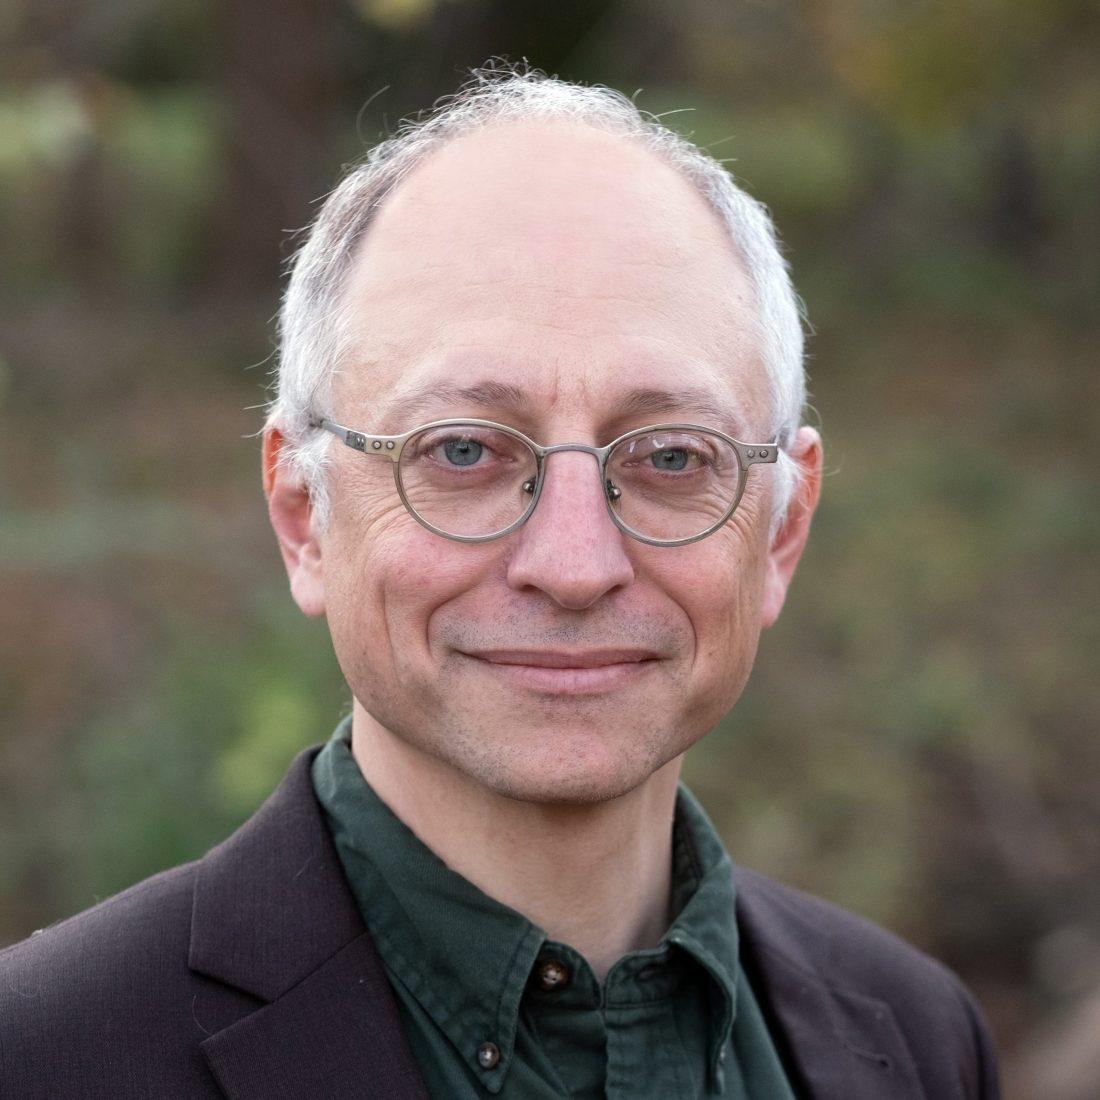 Zachary M. Schrag (Photo by Jim Cassatt)